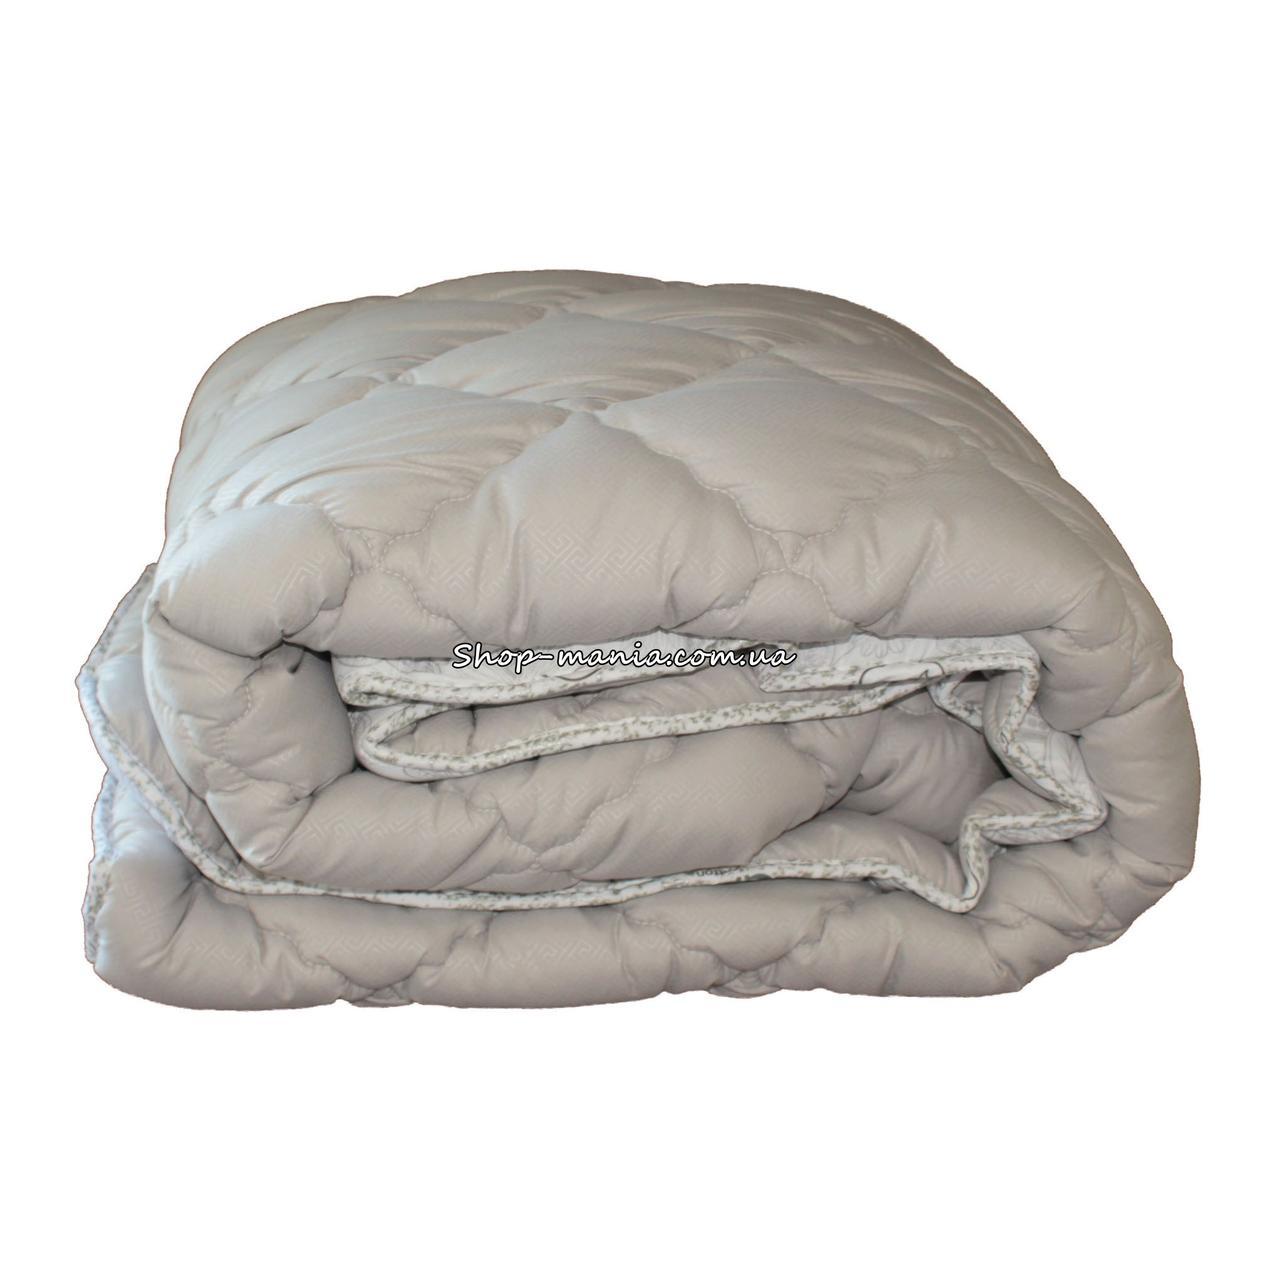 Одеяло зимнее теплое стеганное полуторное 155х210 см холлофайбер ODA SM 8004-1 grey and white